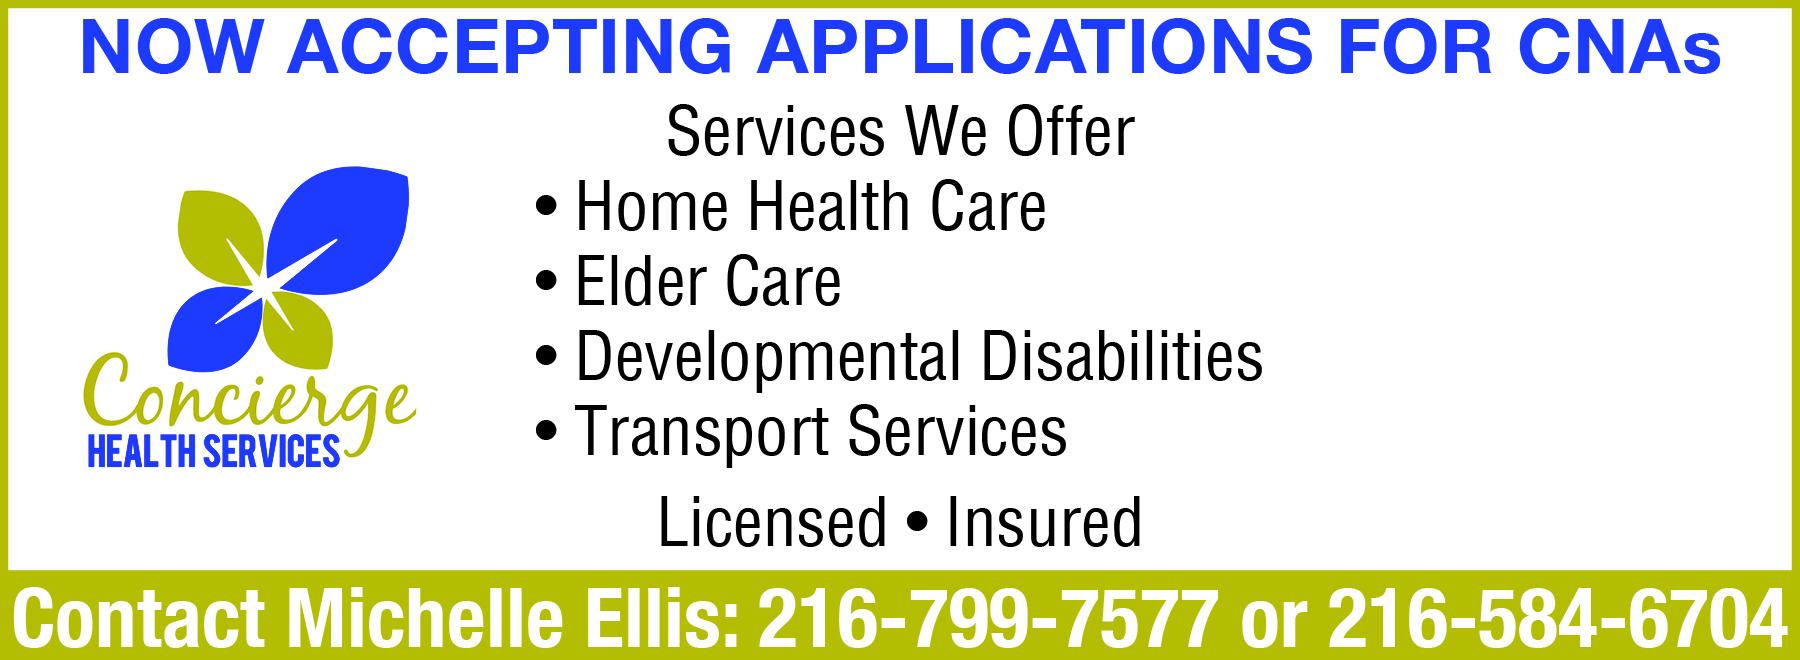 CONCIERGE HEALTH SERVICES | Child & Elderly Care Services